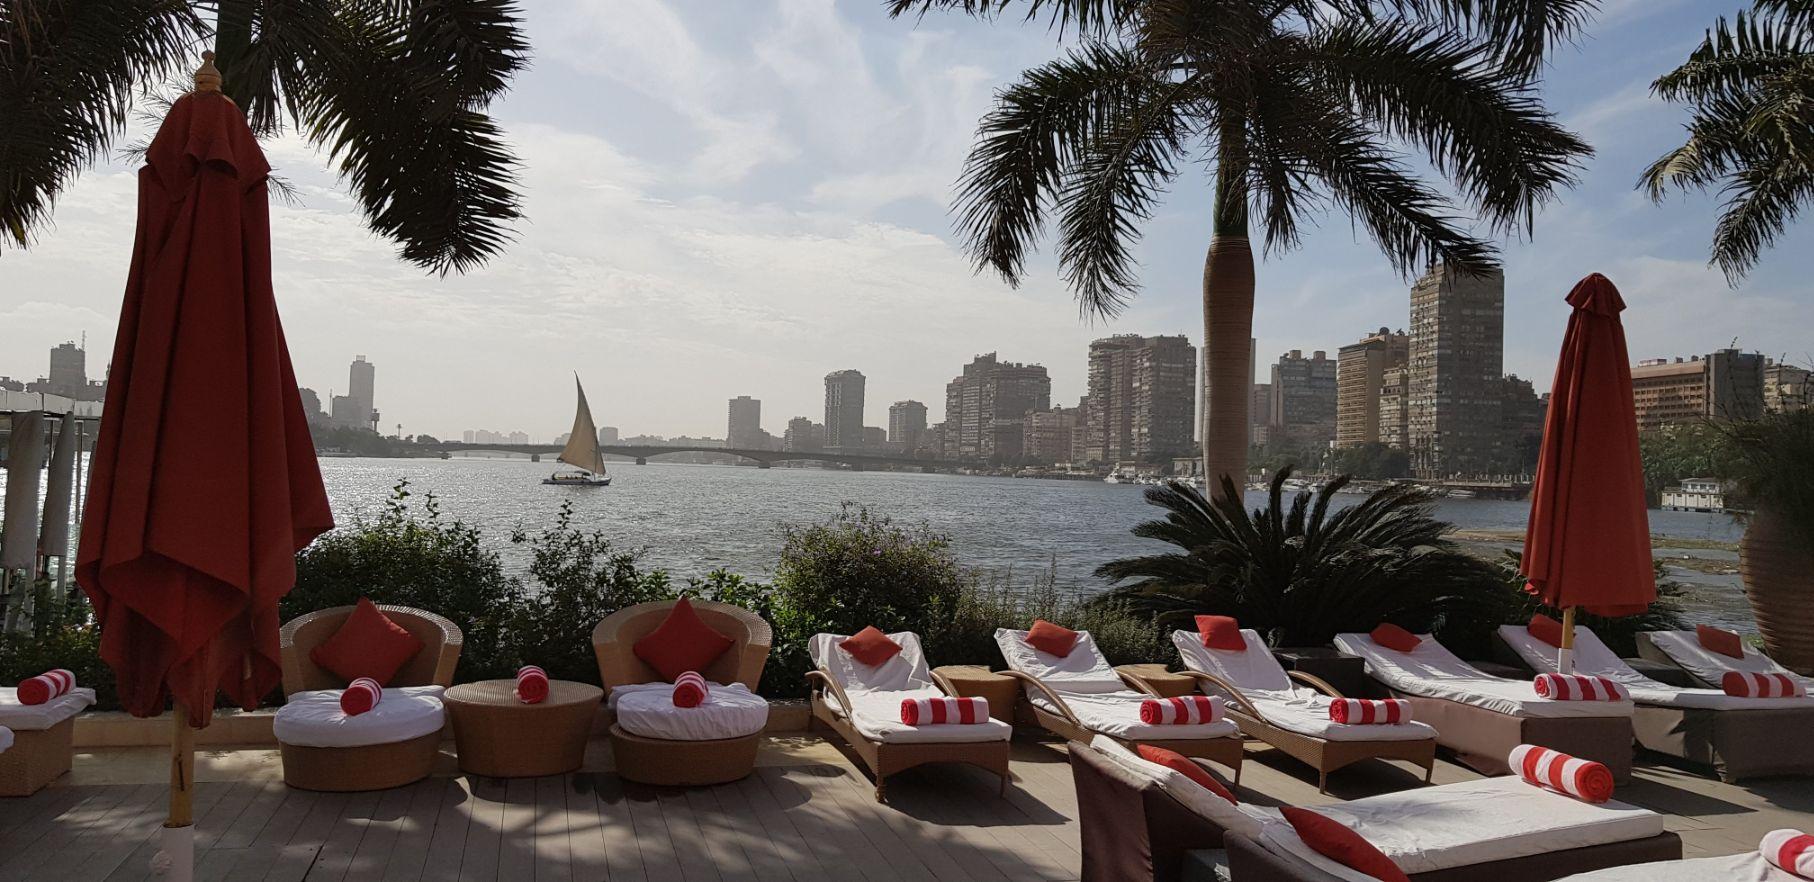 Área de piscina - Hotel Sofitel Cairo Nile El Gezirah